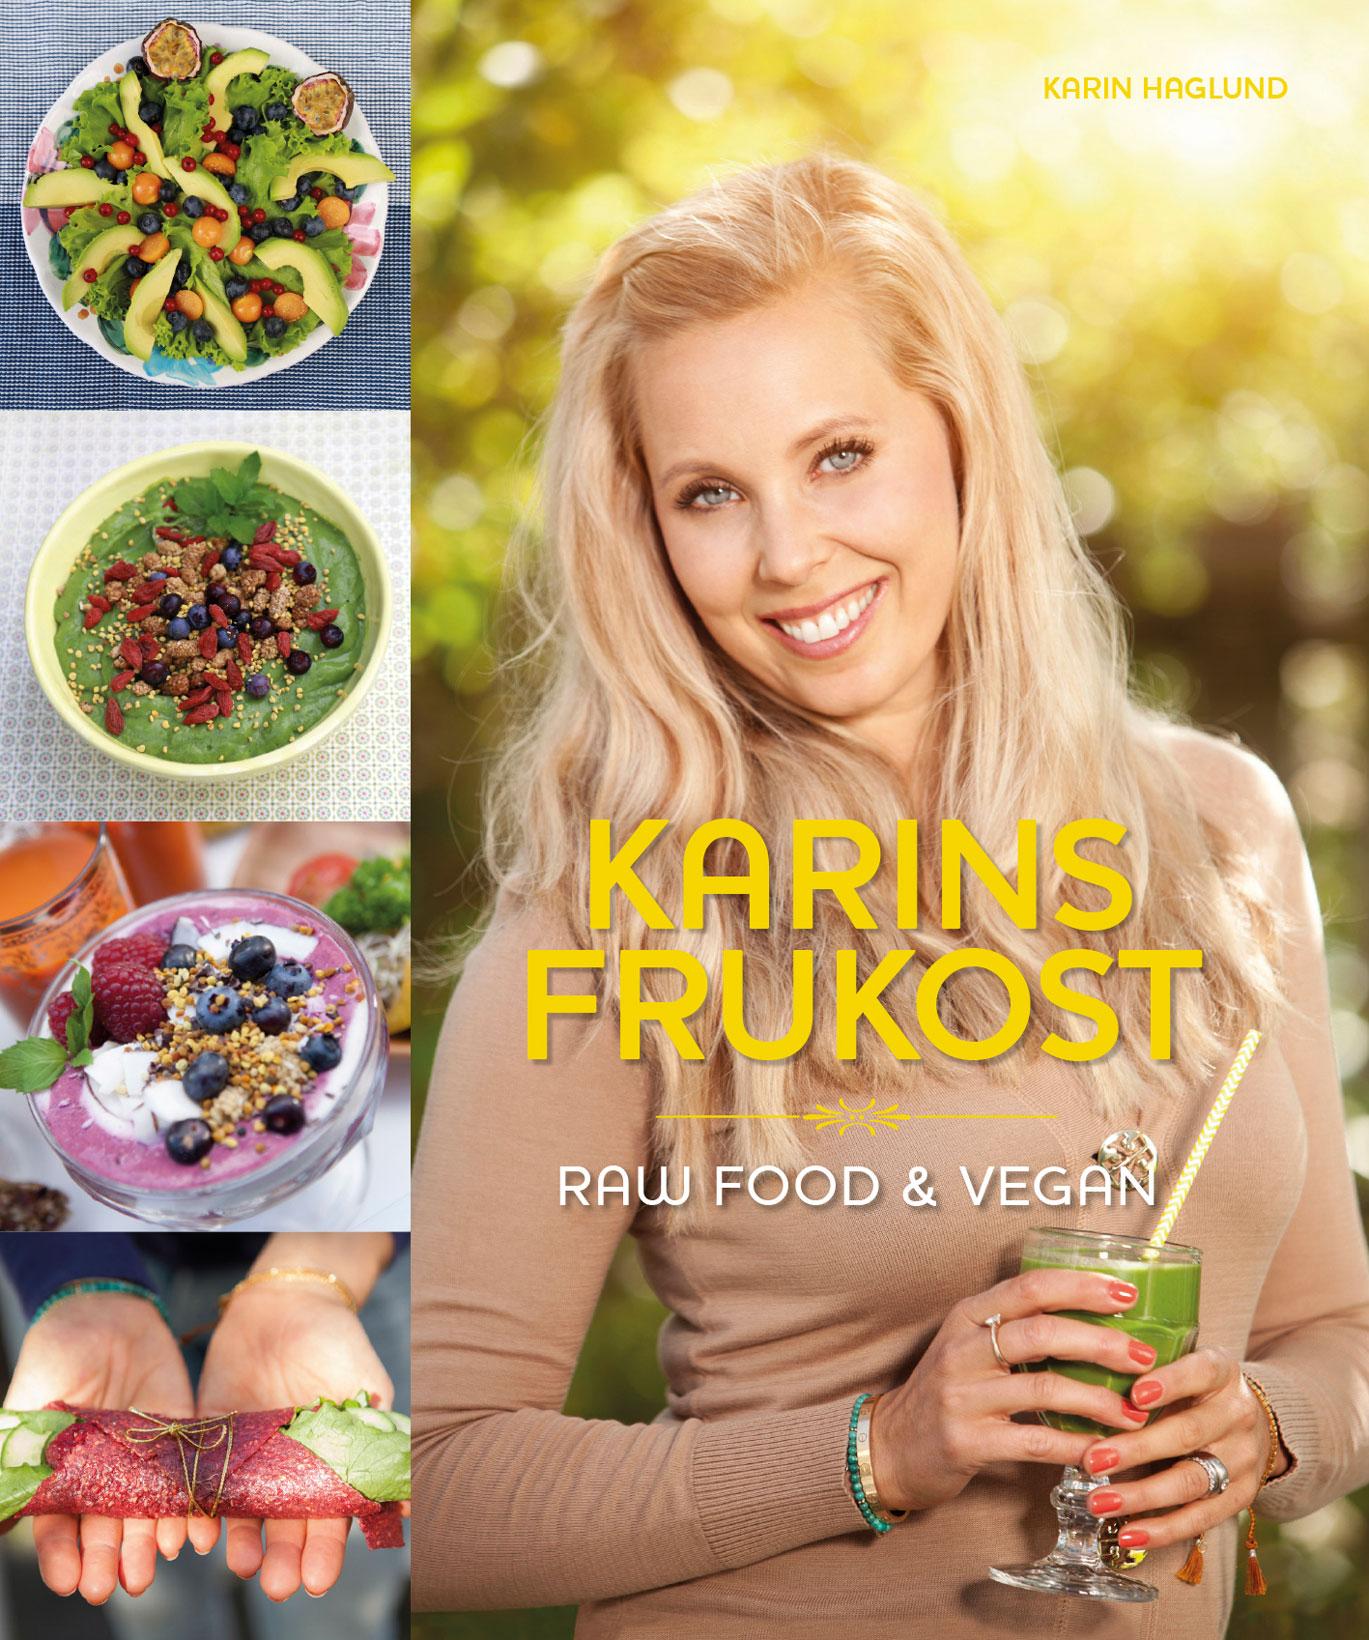 Karins-frukost-raw-food-vegan